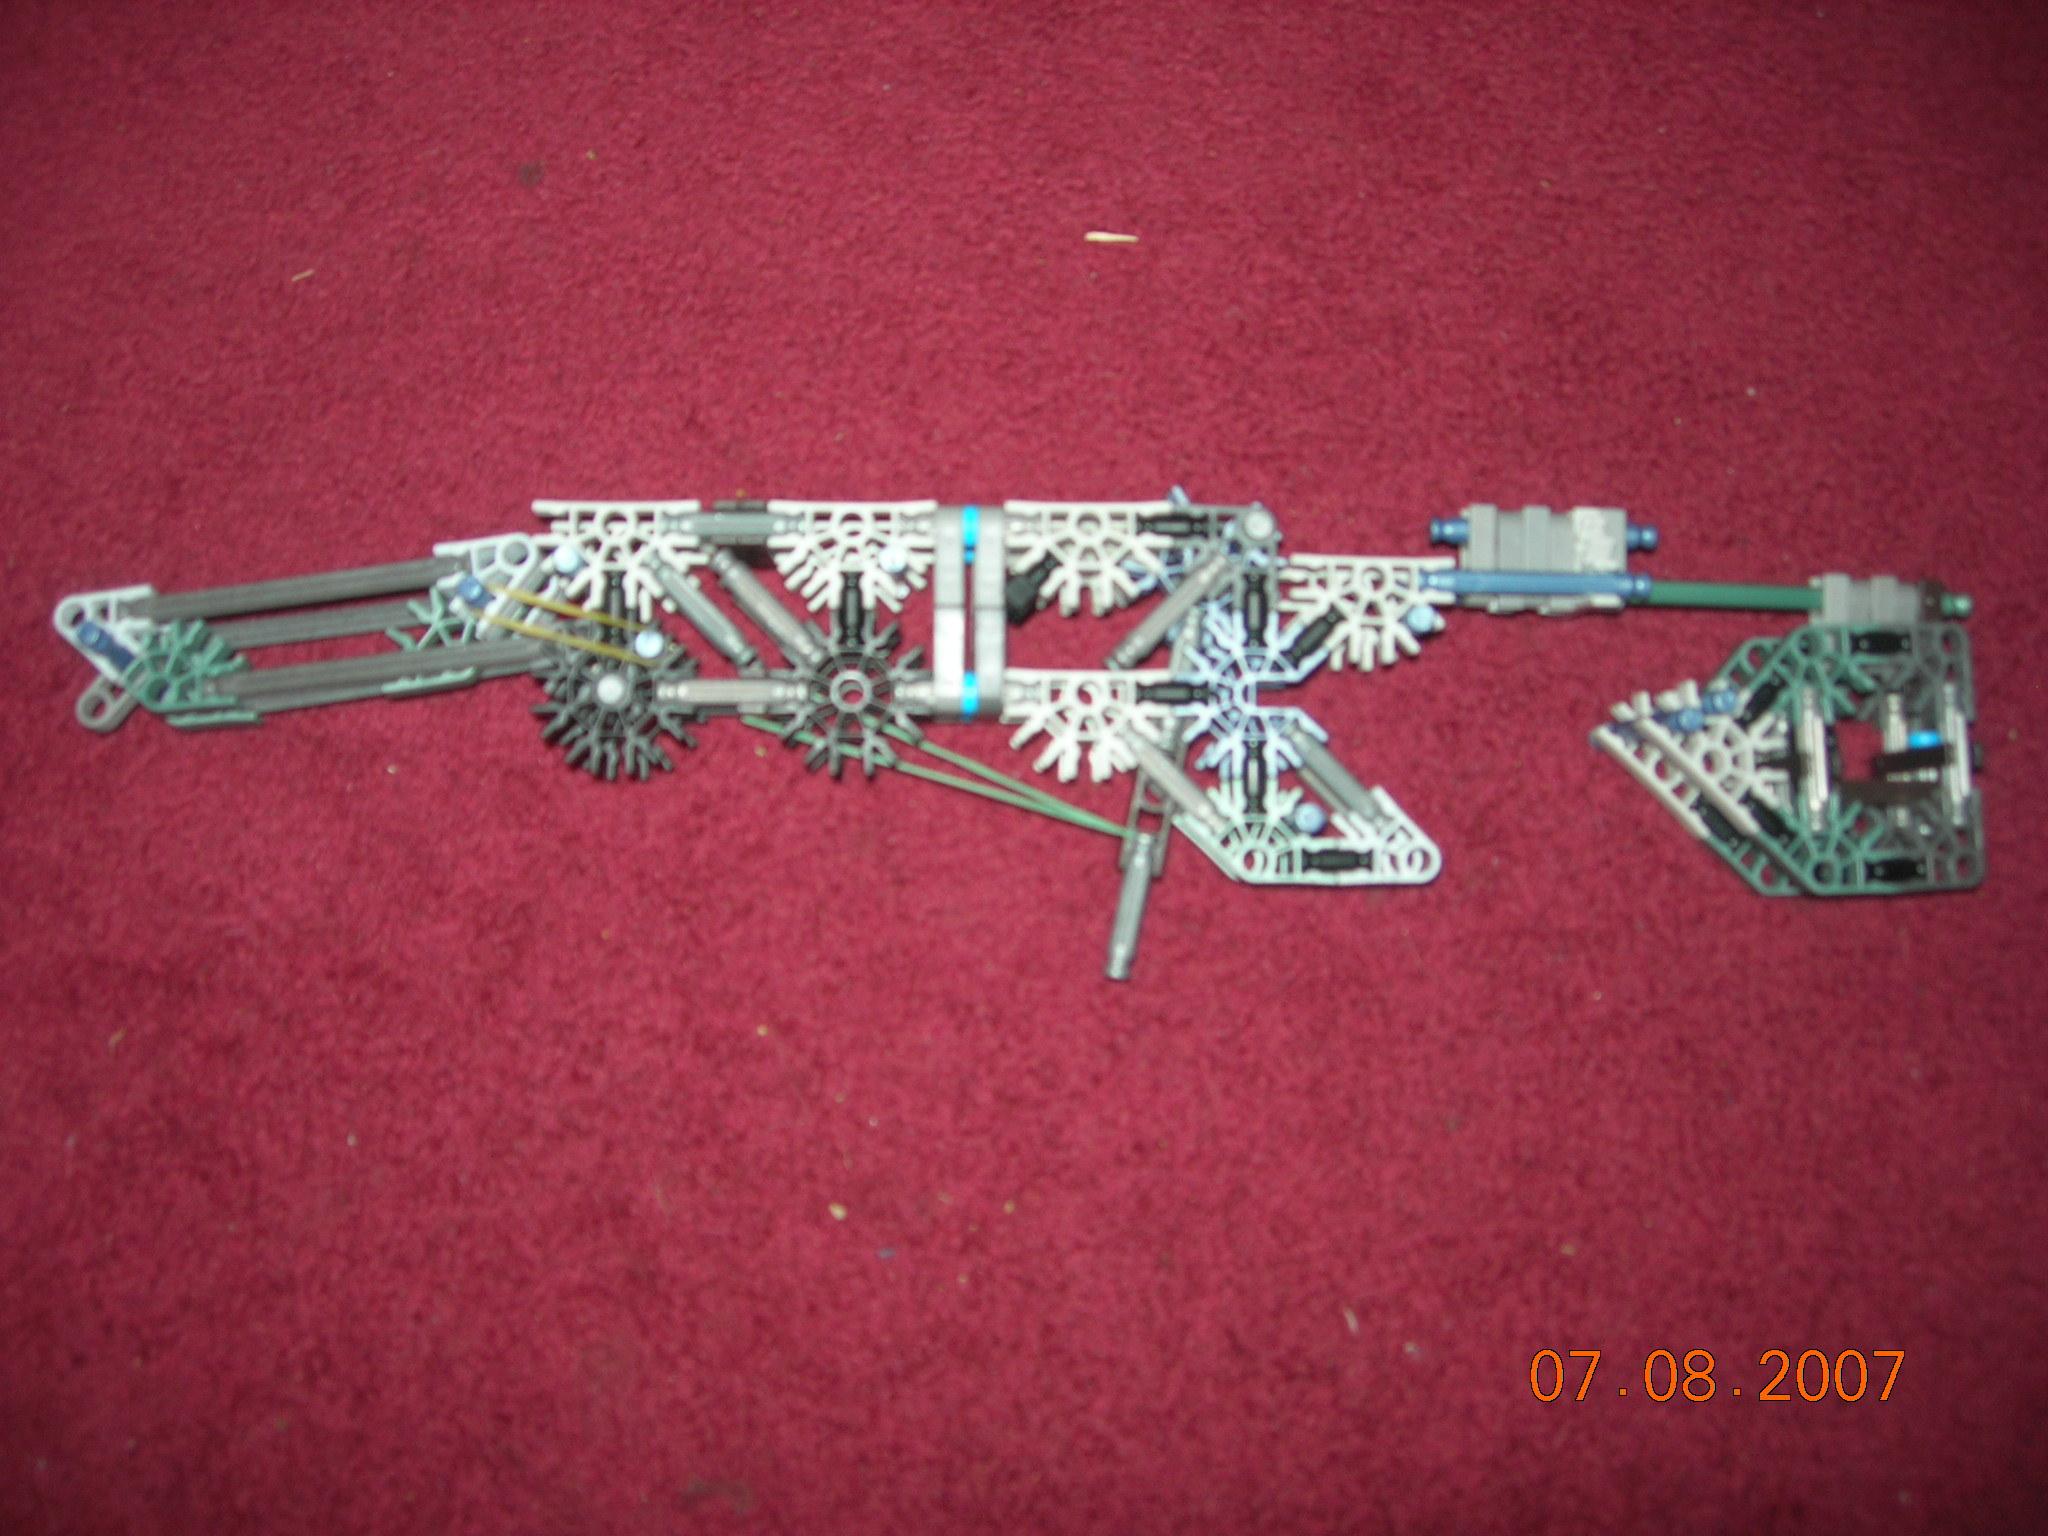 mepains rubberband gun that folds up